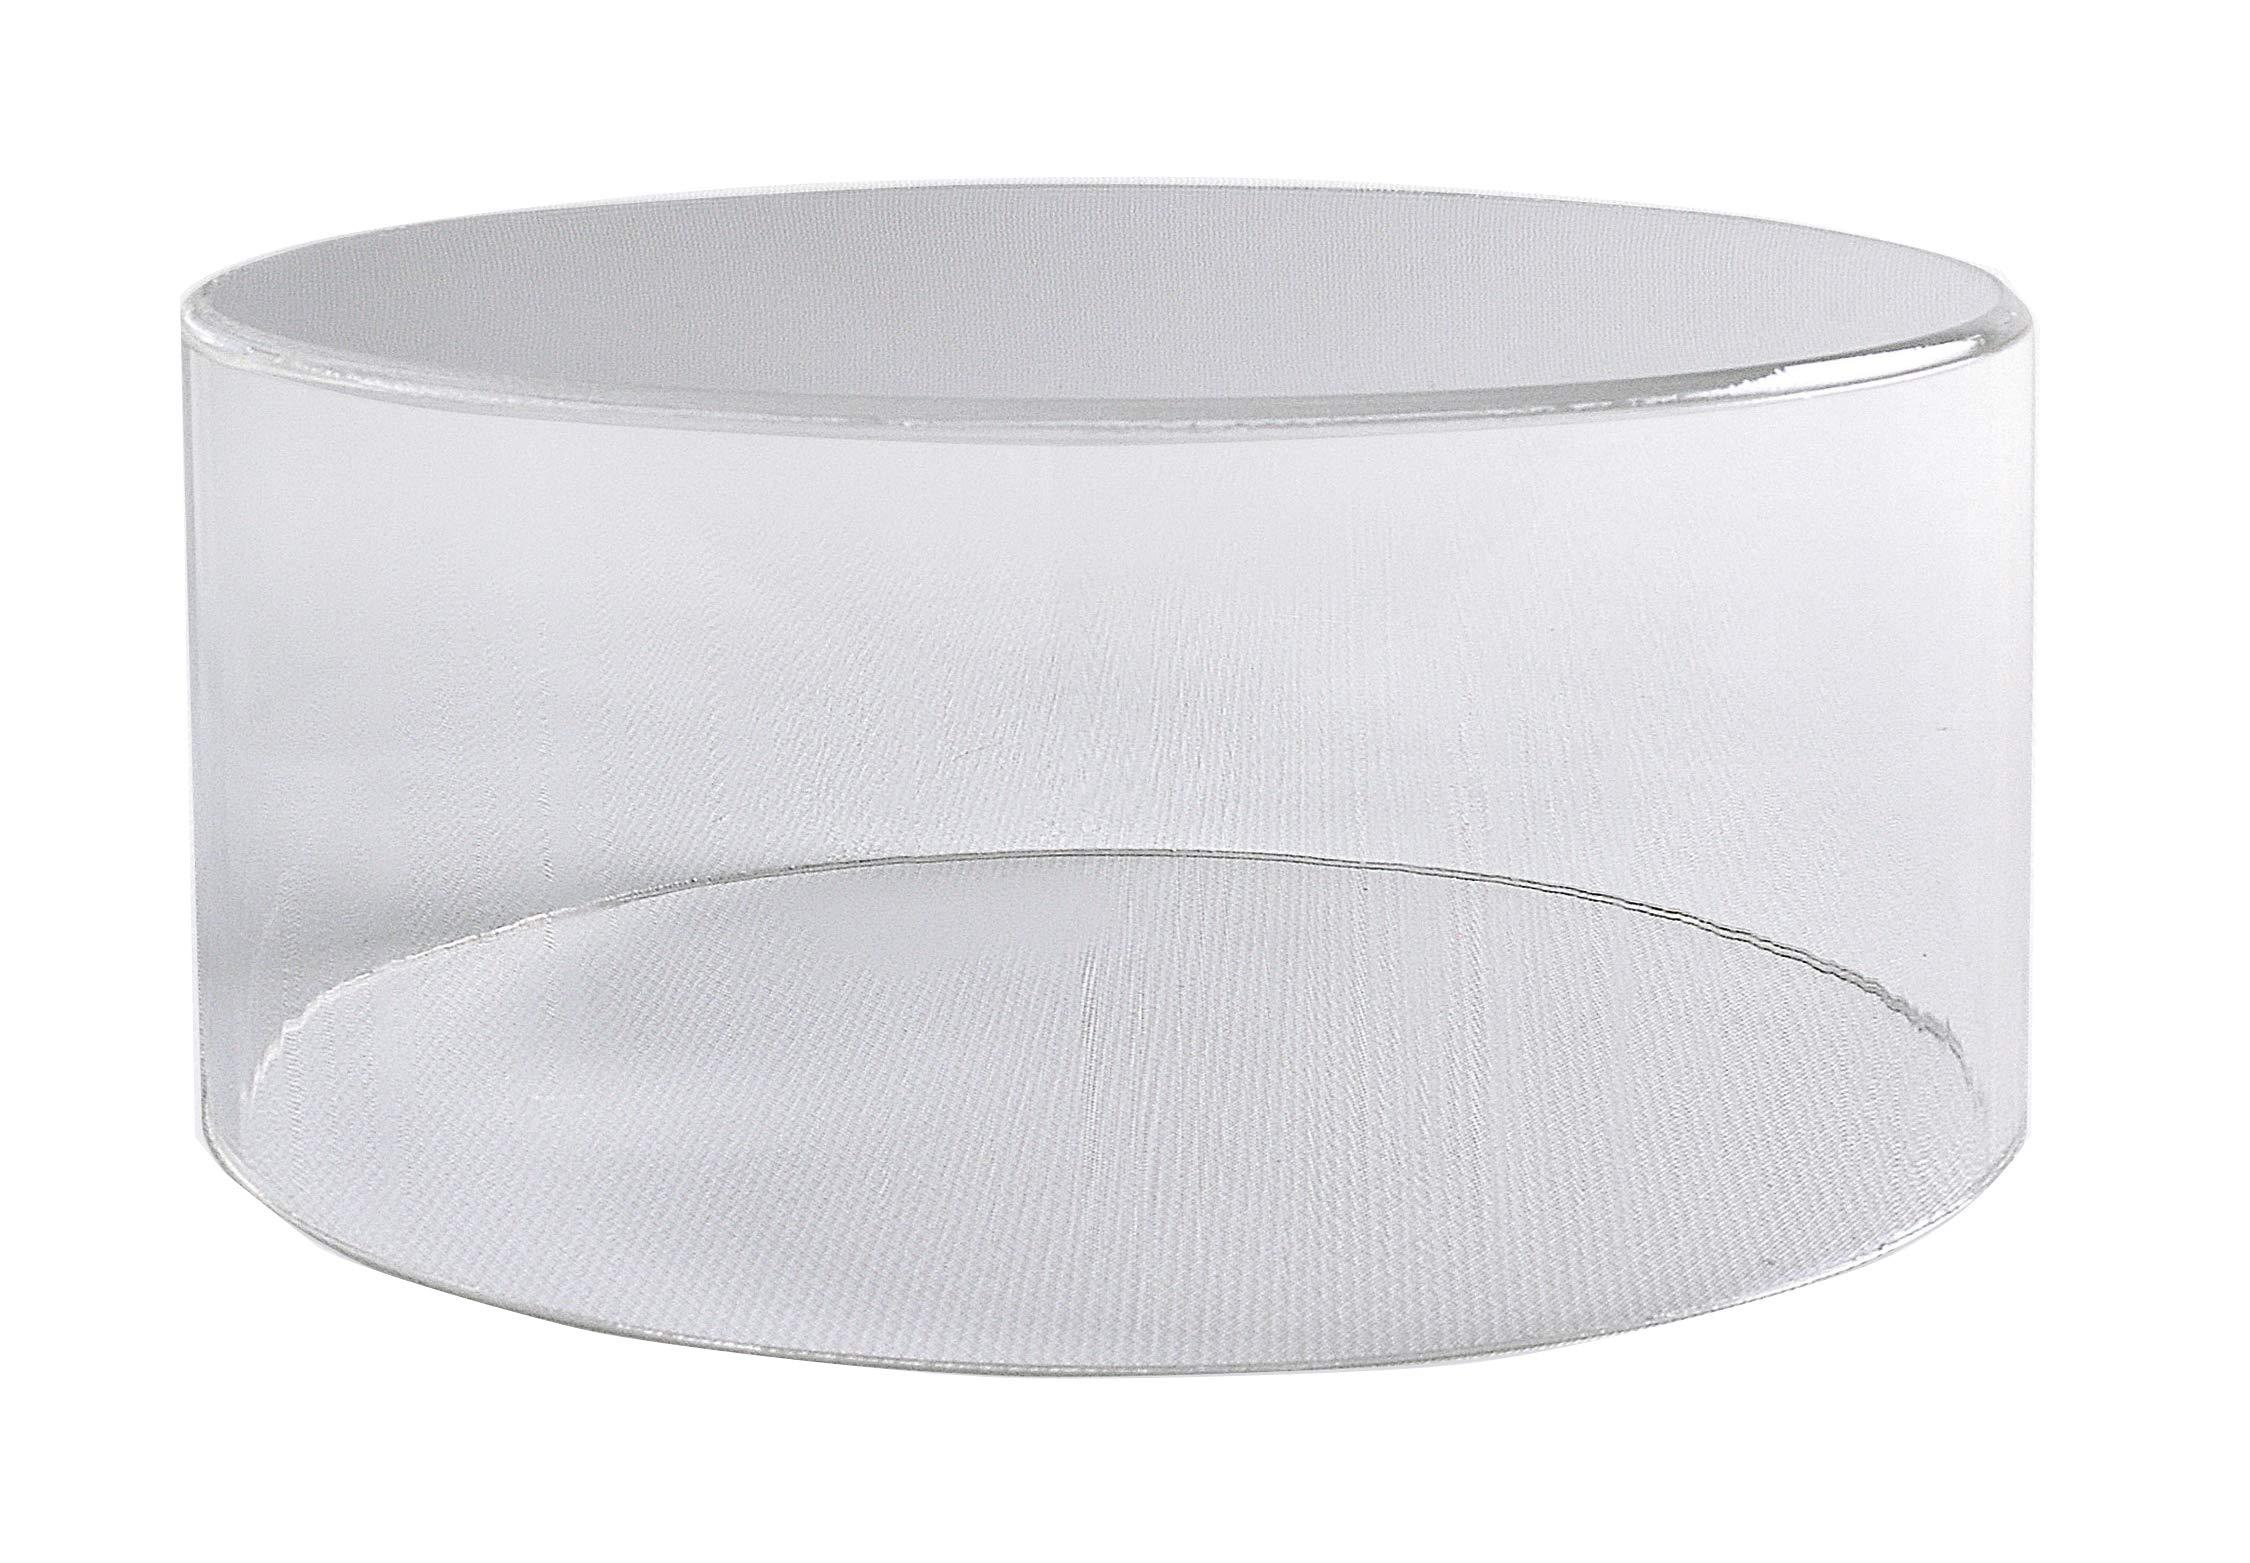 Round Acrylic Risers 6'' H x 10'' Diameter | Round Stand | Pedestal | Acrylic Bin | Cupcake Stand | Cake Display | Buffet Display by CHOICE ACRYLIC DISPLAYS